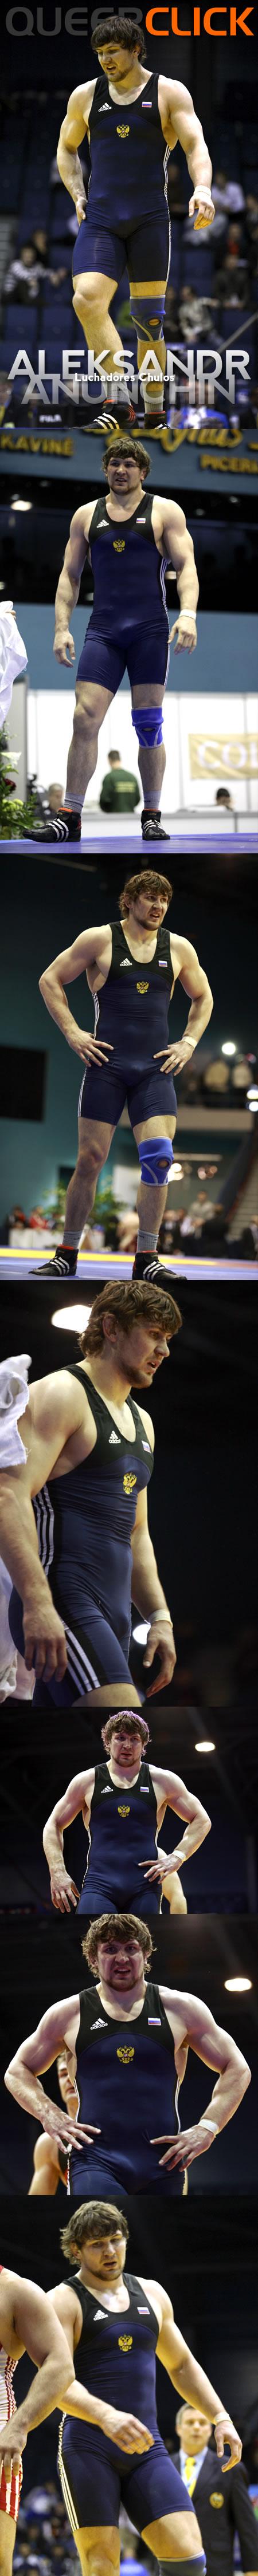 Luchadores Chulos: Aleksandr Anunchin